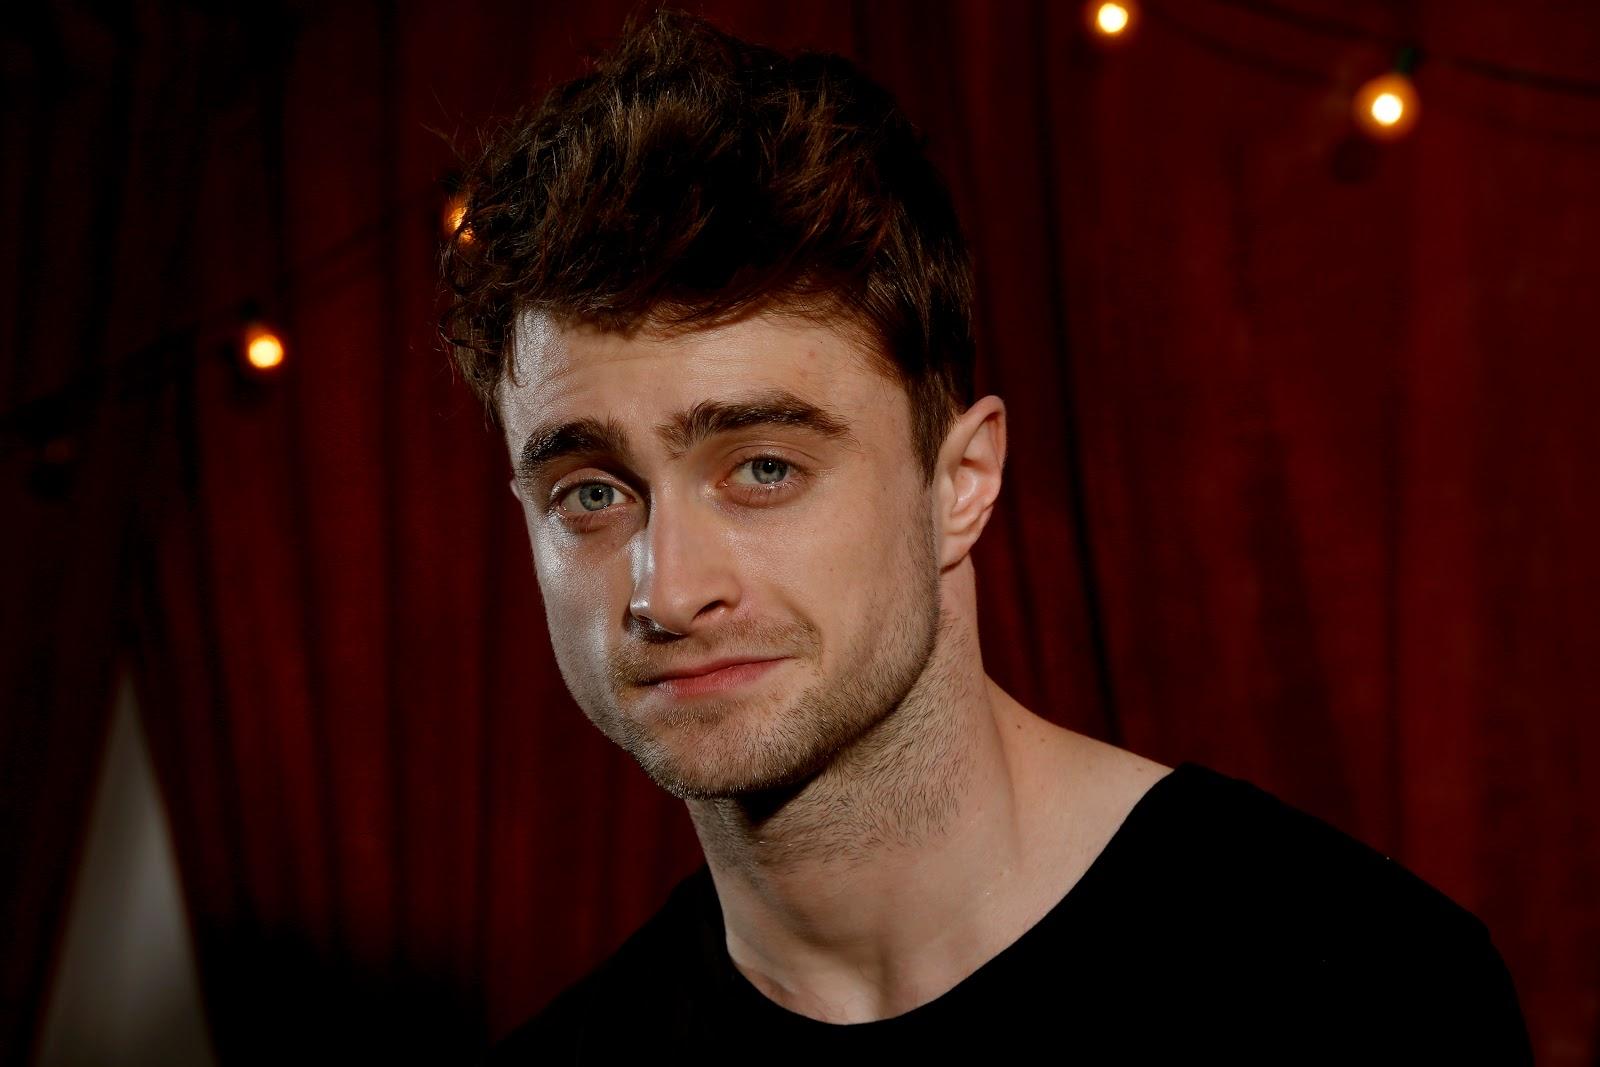 Watch Daniel Radcliffe (born 1989) video